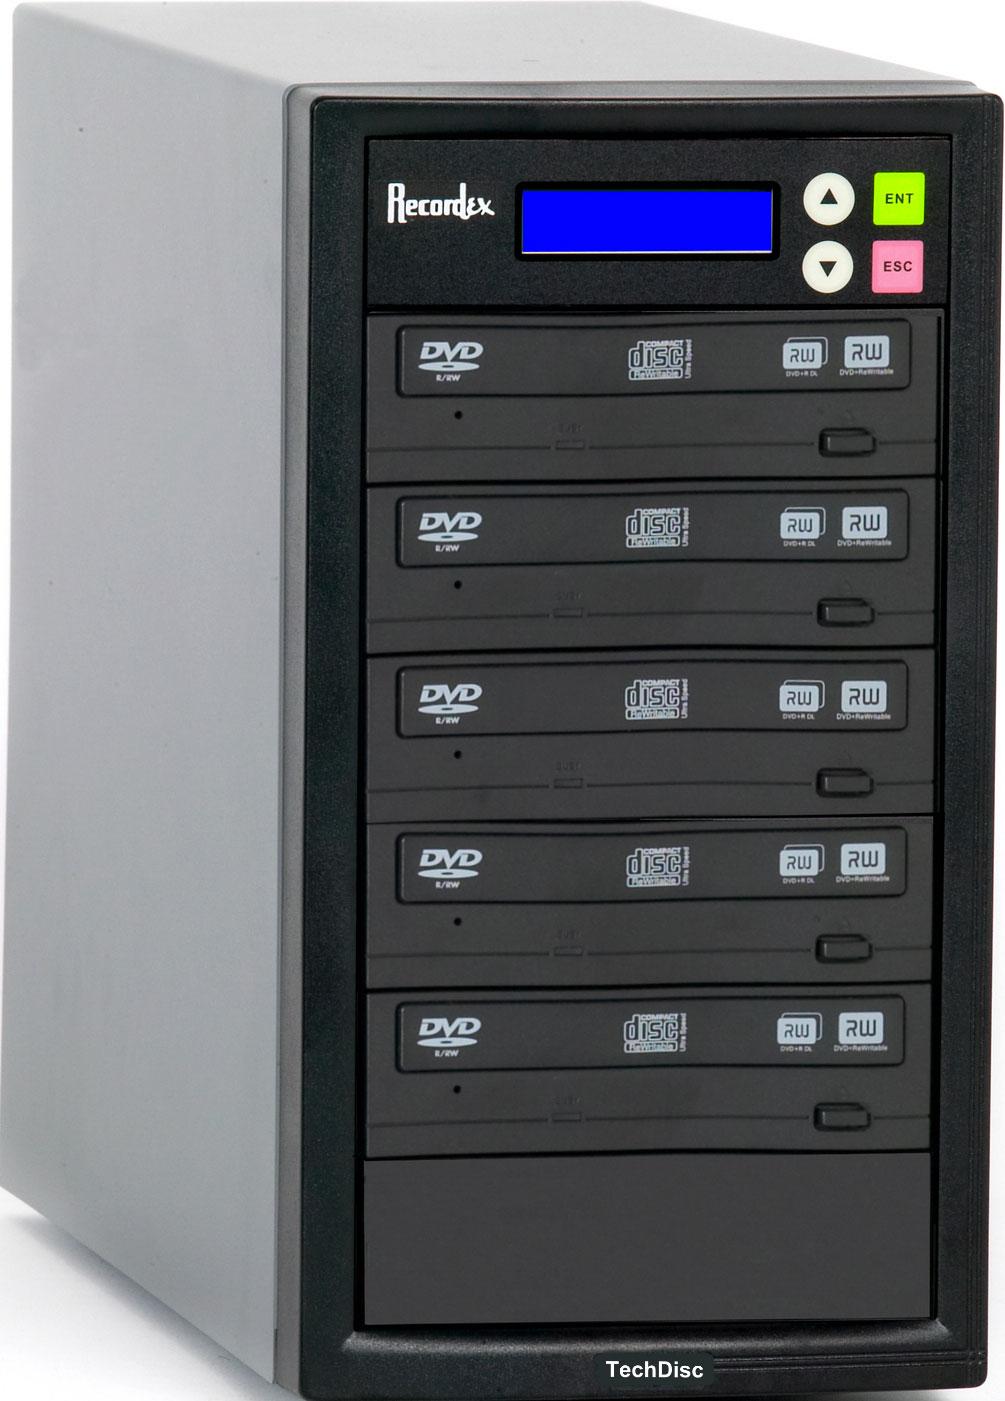 CD/DVD Duplicator with 5 Target Drives, 250 GB Hard Drive